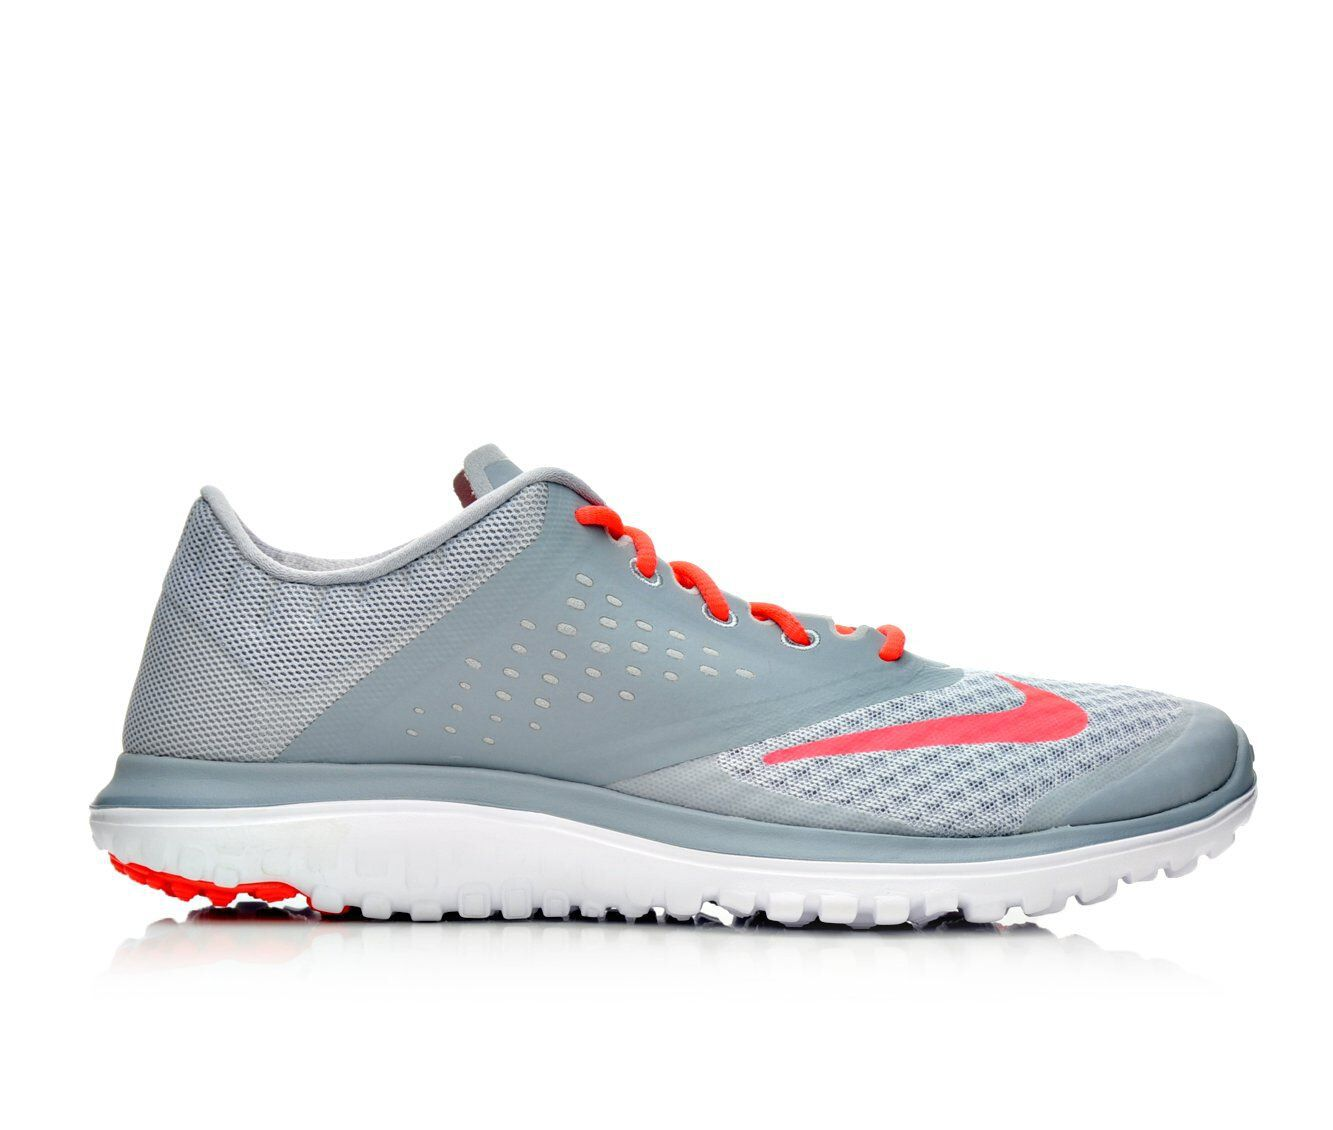 san francisco c9e76 aa8bf ... promo code for womens nike fs lite run 2 running shoes 0b186 60e79